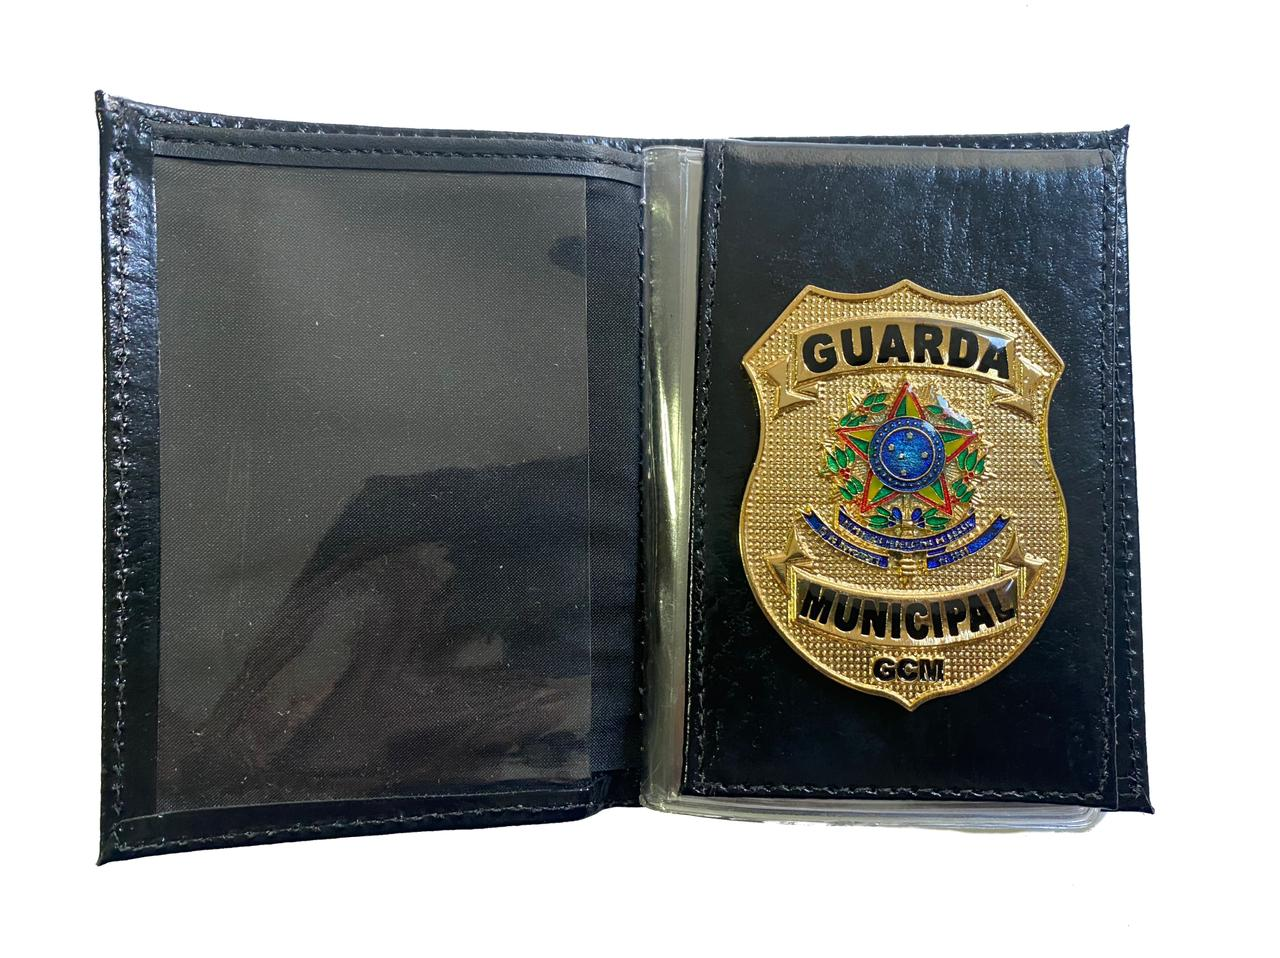 GUARDA MUNICIPAL NACIONAL - GCM - MOD NOVO